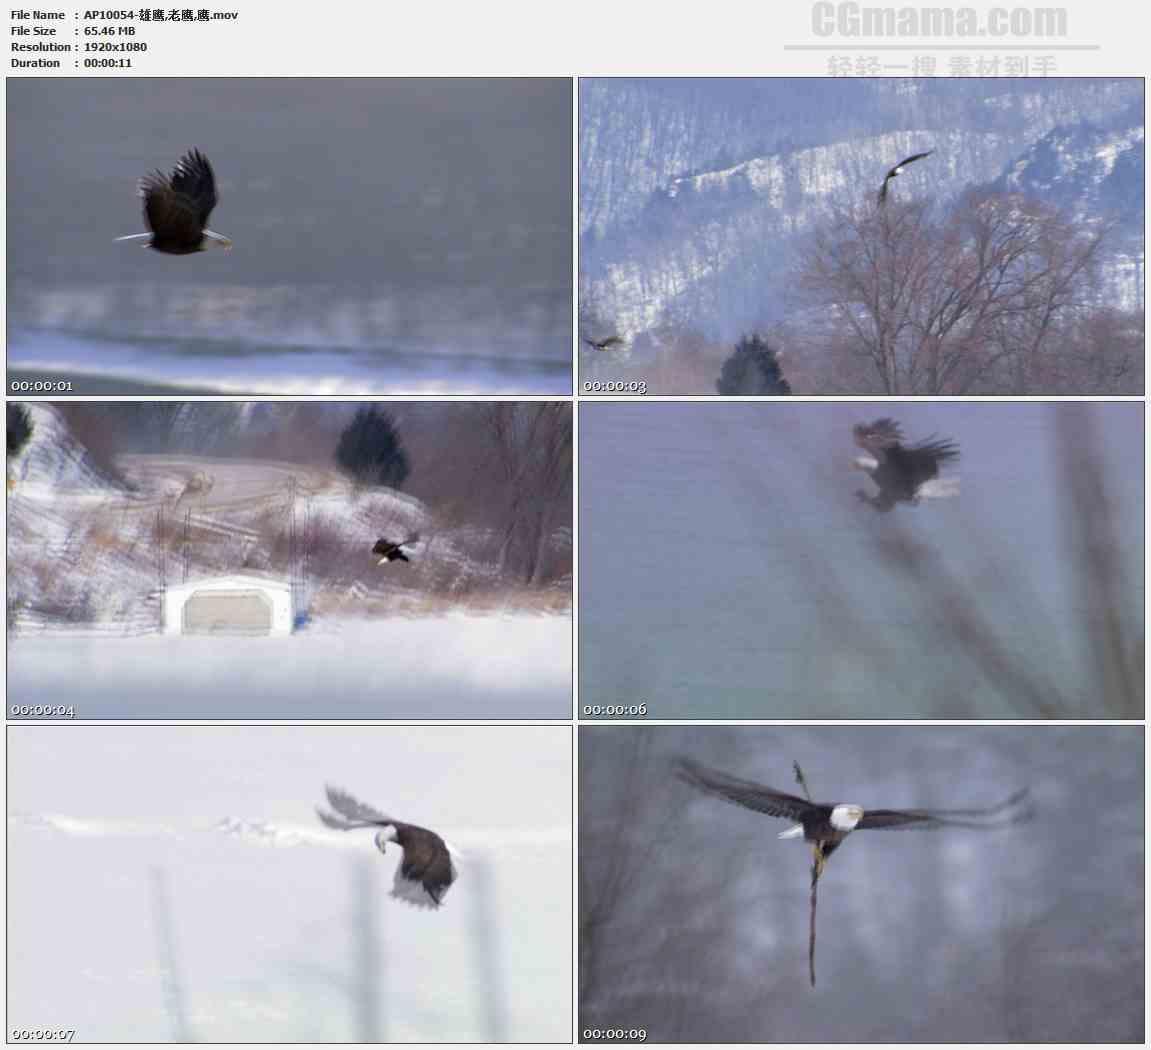 AP10054-雄鹰老鹰飞翔盘旋高清实拍视频素材